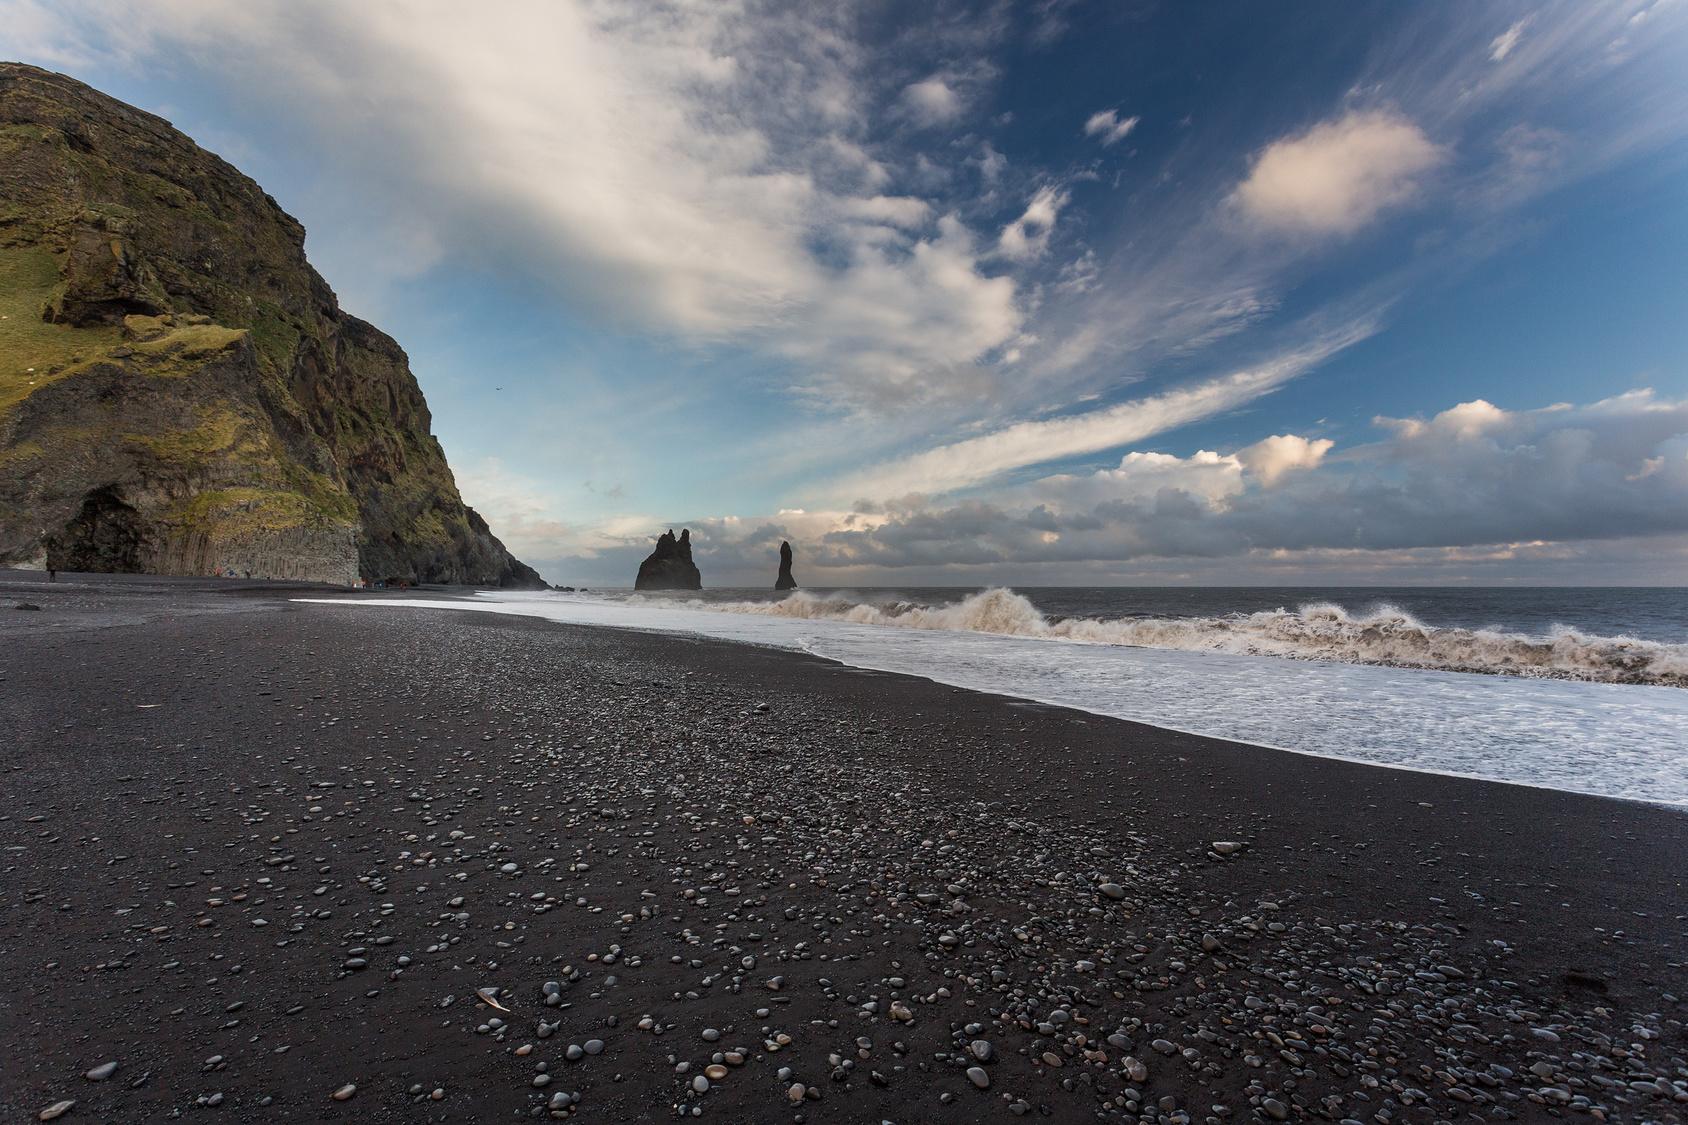 Black Sand Beach, Izland - A fekete homokos part